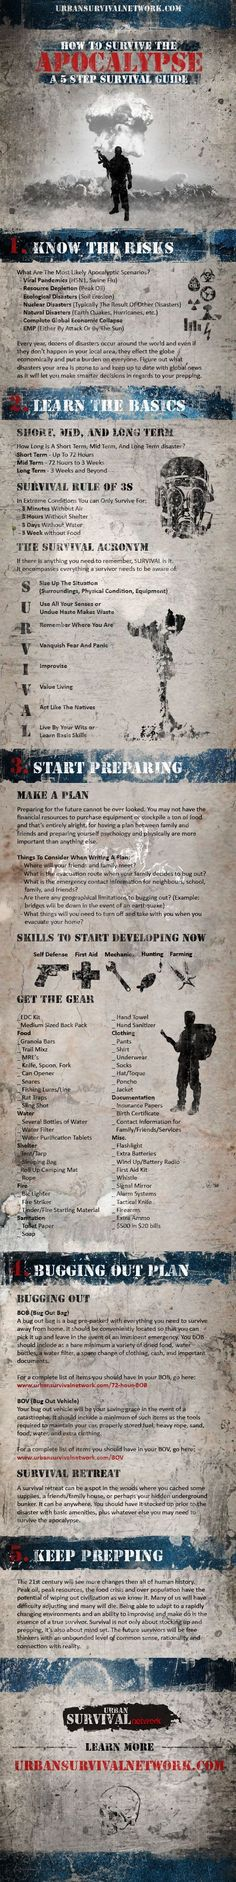 How to Survive the Apocalypse   survivalist ultimate guide.   http://survivallife.com/2014/03/03/survival-infographics/